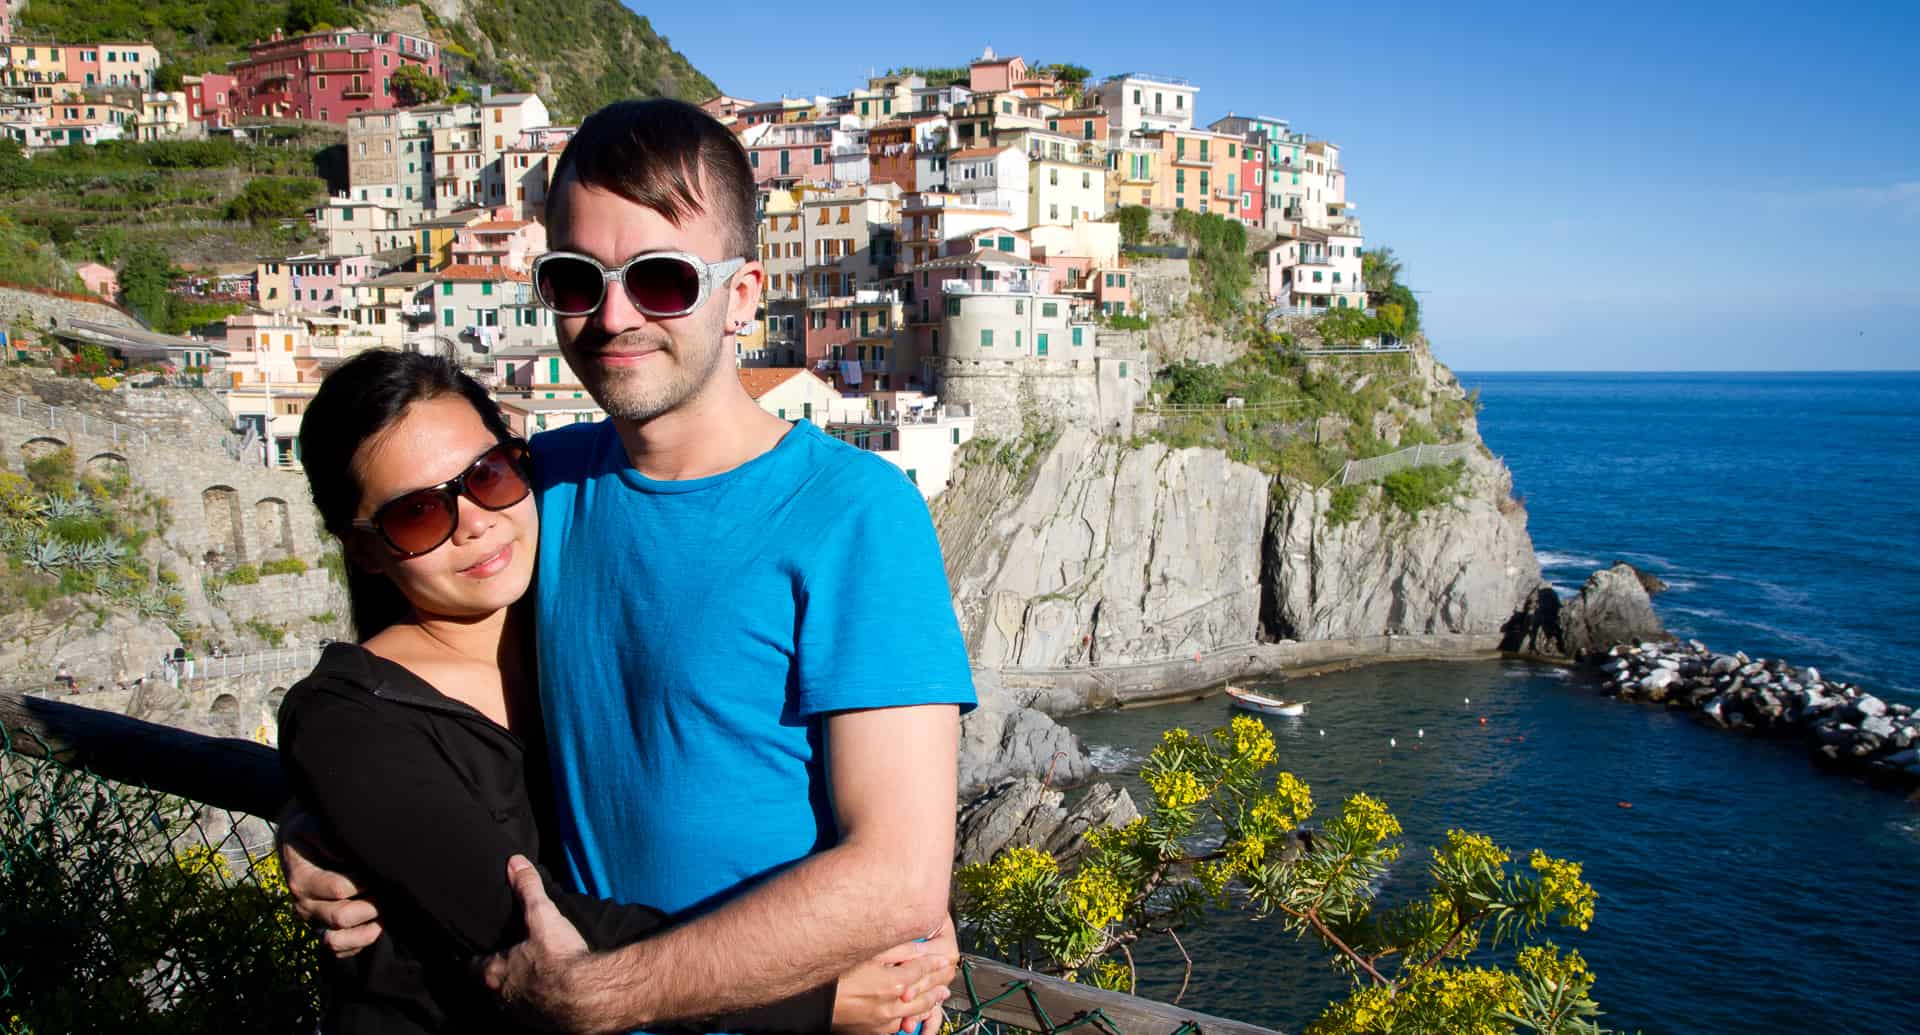 Our incredible honeymoon in Cinque Terre